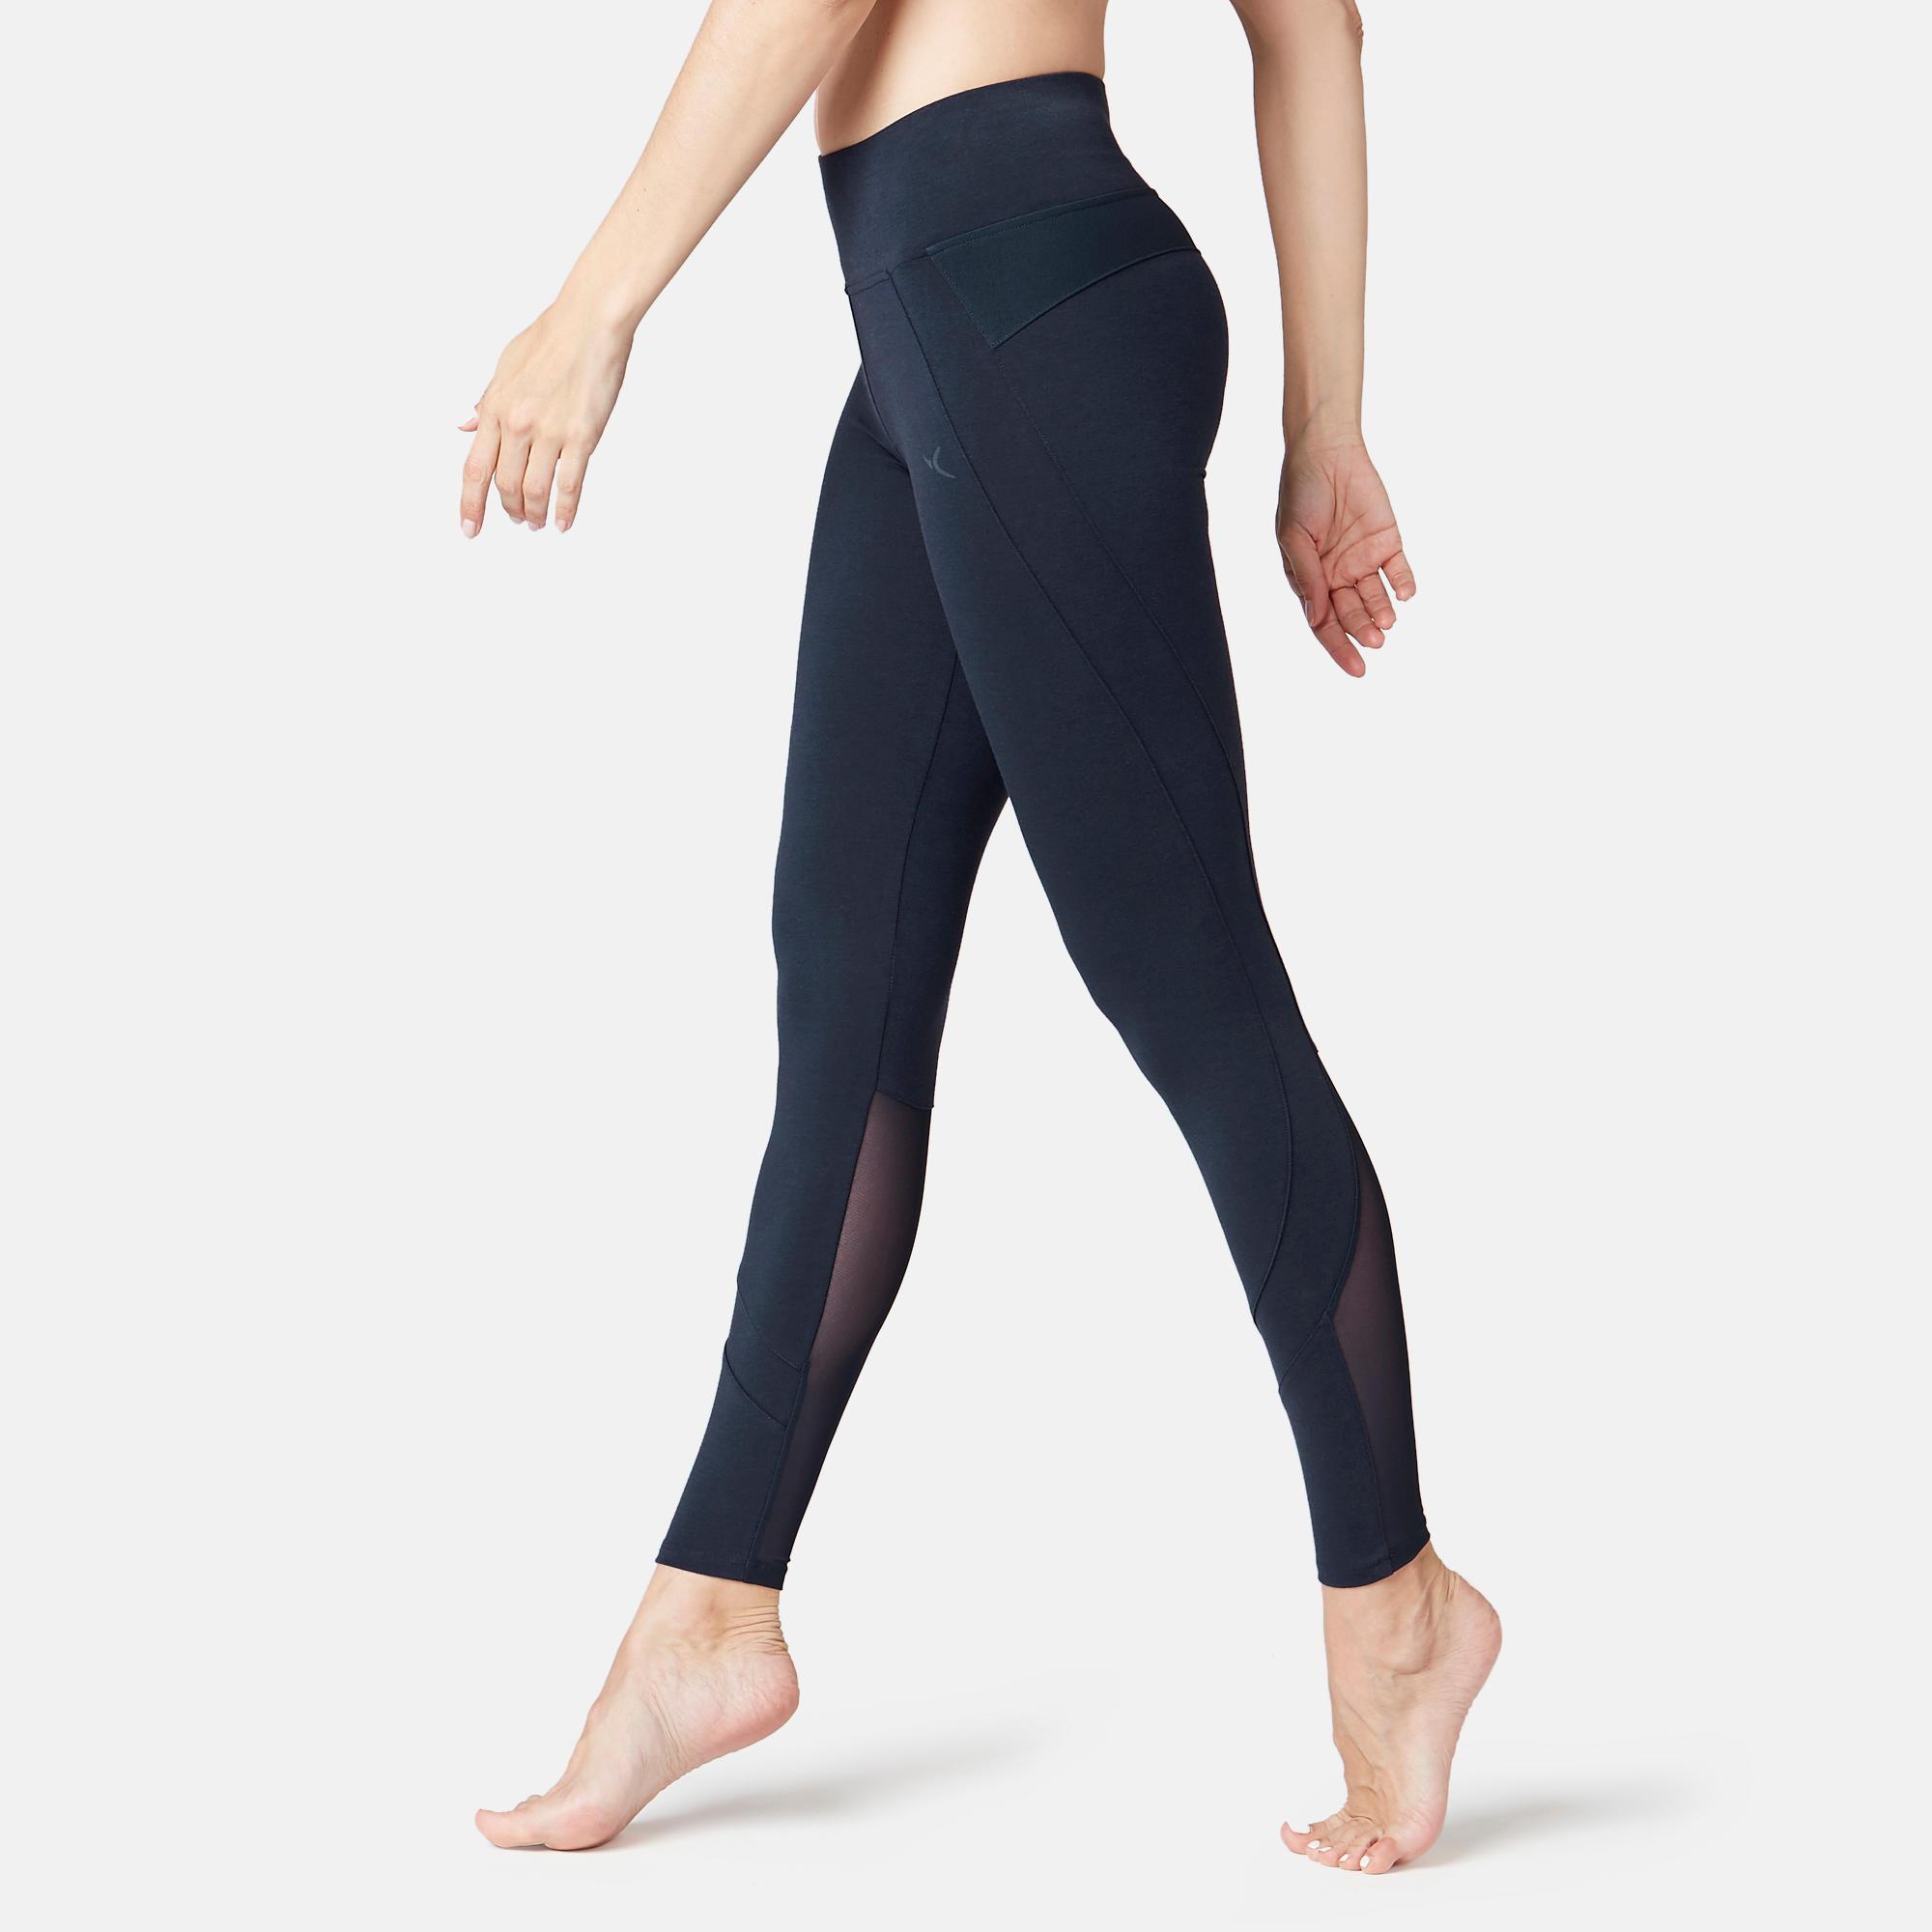 Legging sport taille haute 520 femme en coton bleu marine domyos